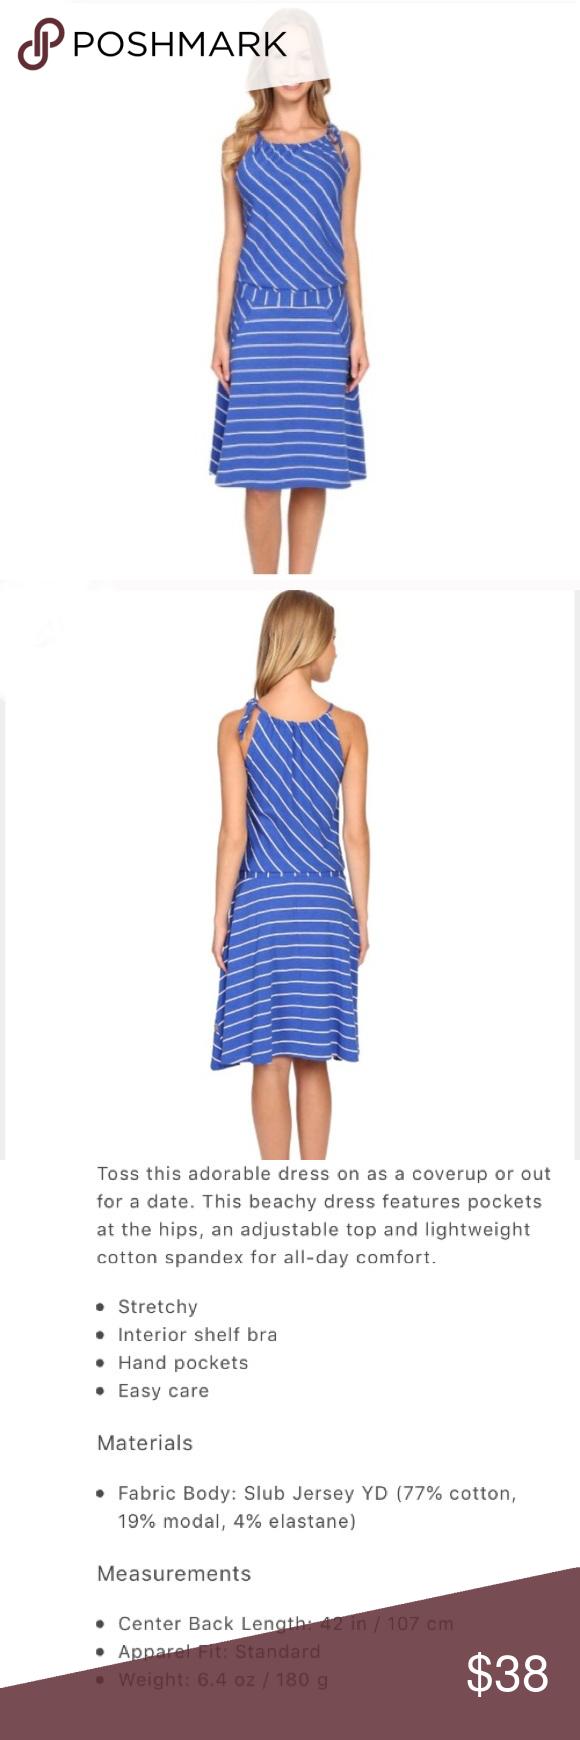 Mountain Hardwear Dress With Built In Bra Jersey Dress Dresses Fitted Dress [ 1740 x 580 Pixel ]